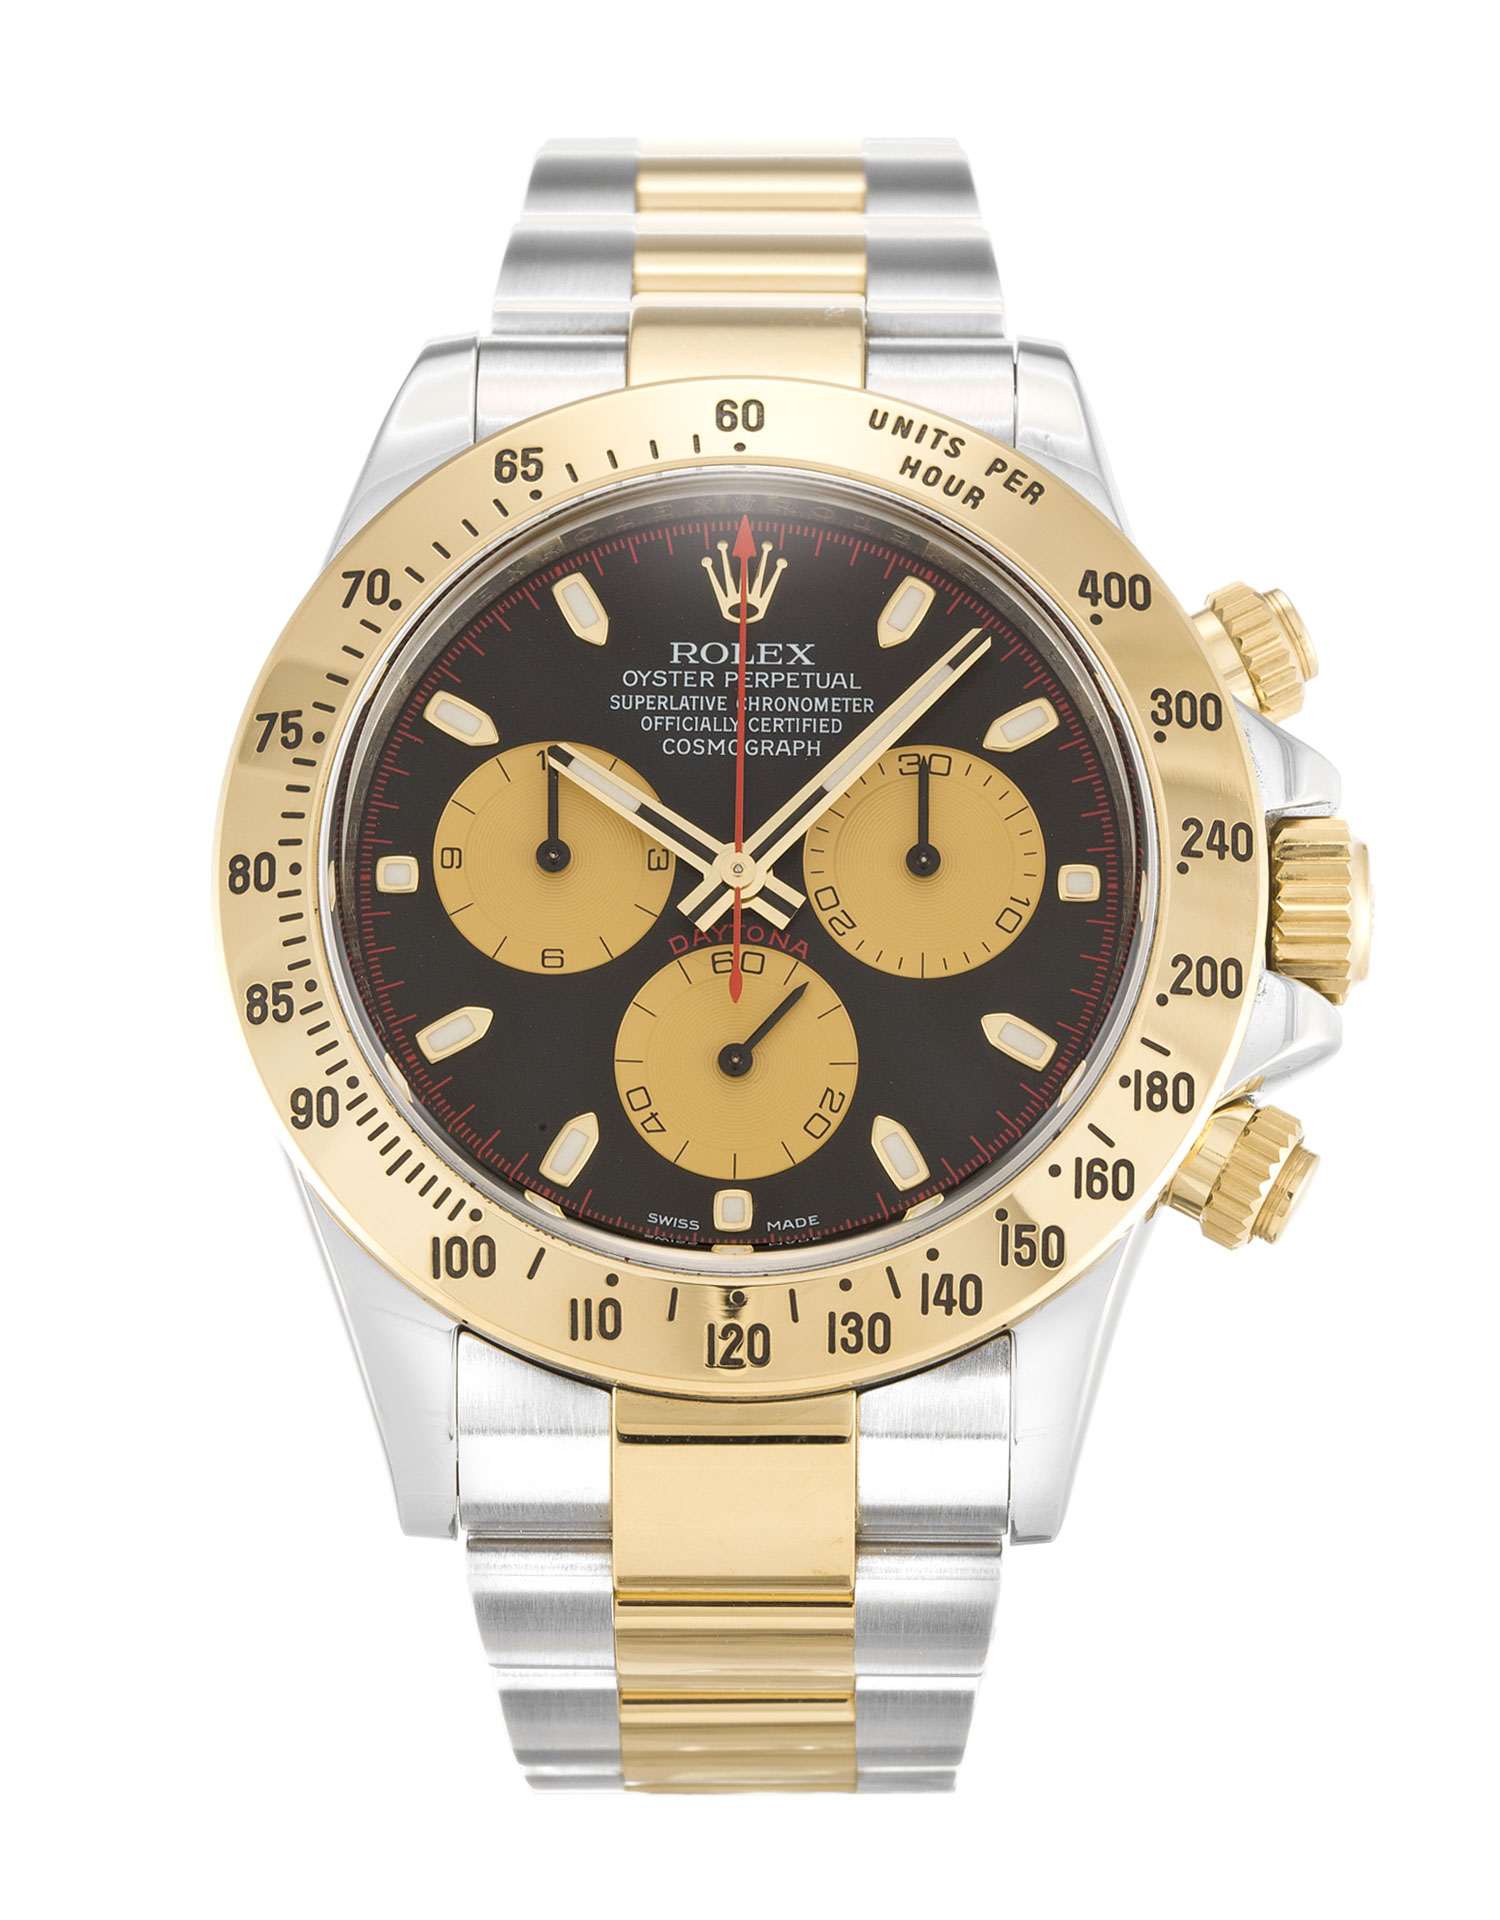 Rolex Cosmograph Daytona 116523 Rolesor Black Dial width=500